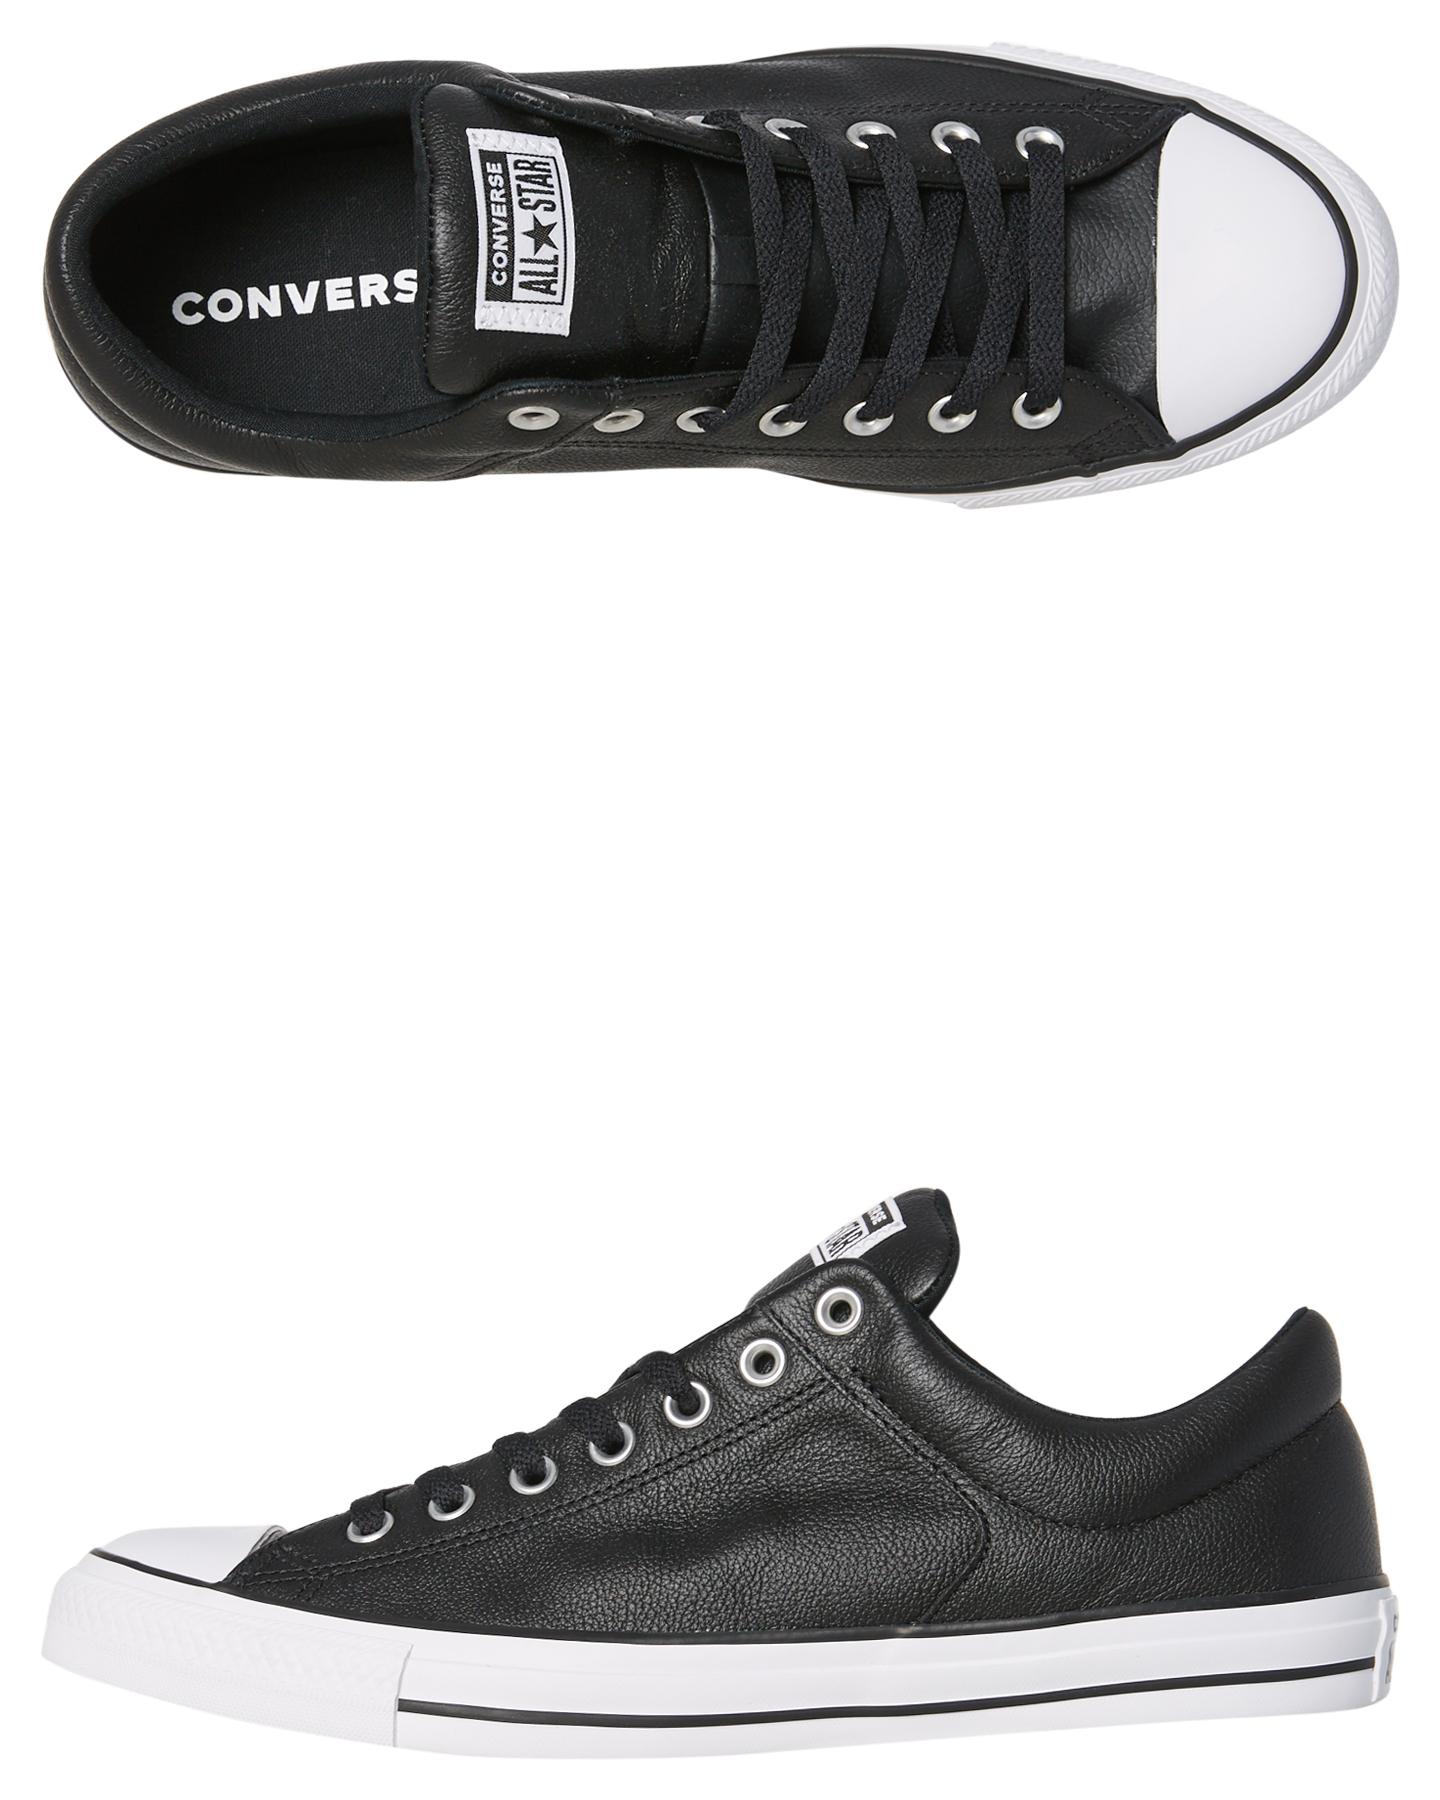 Converse Mens Chuck Taylor All Star Street Leather Shoe Black Womens ... 2b2a7ffee792e